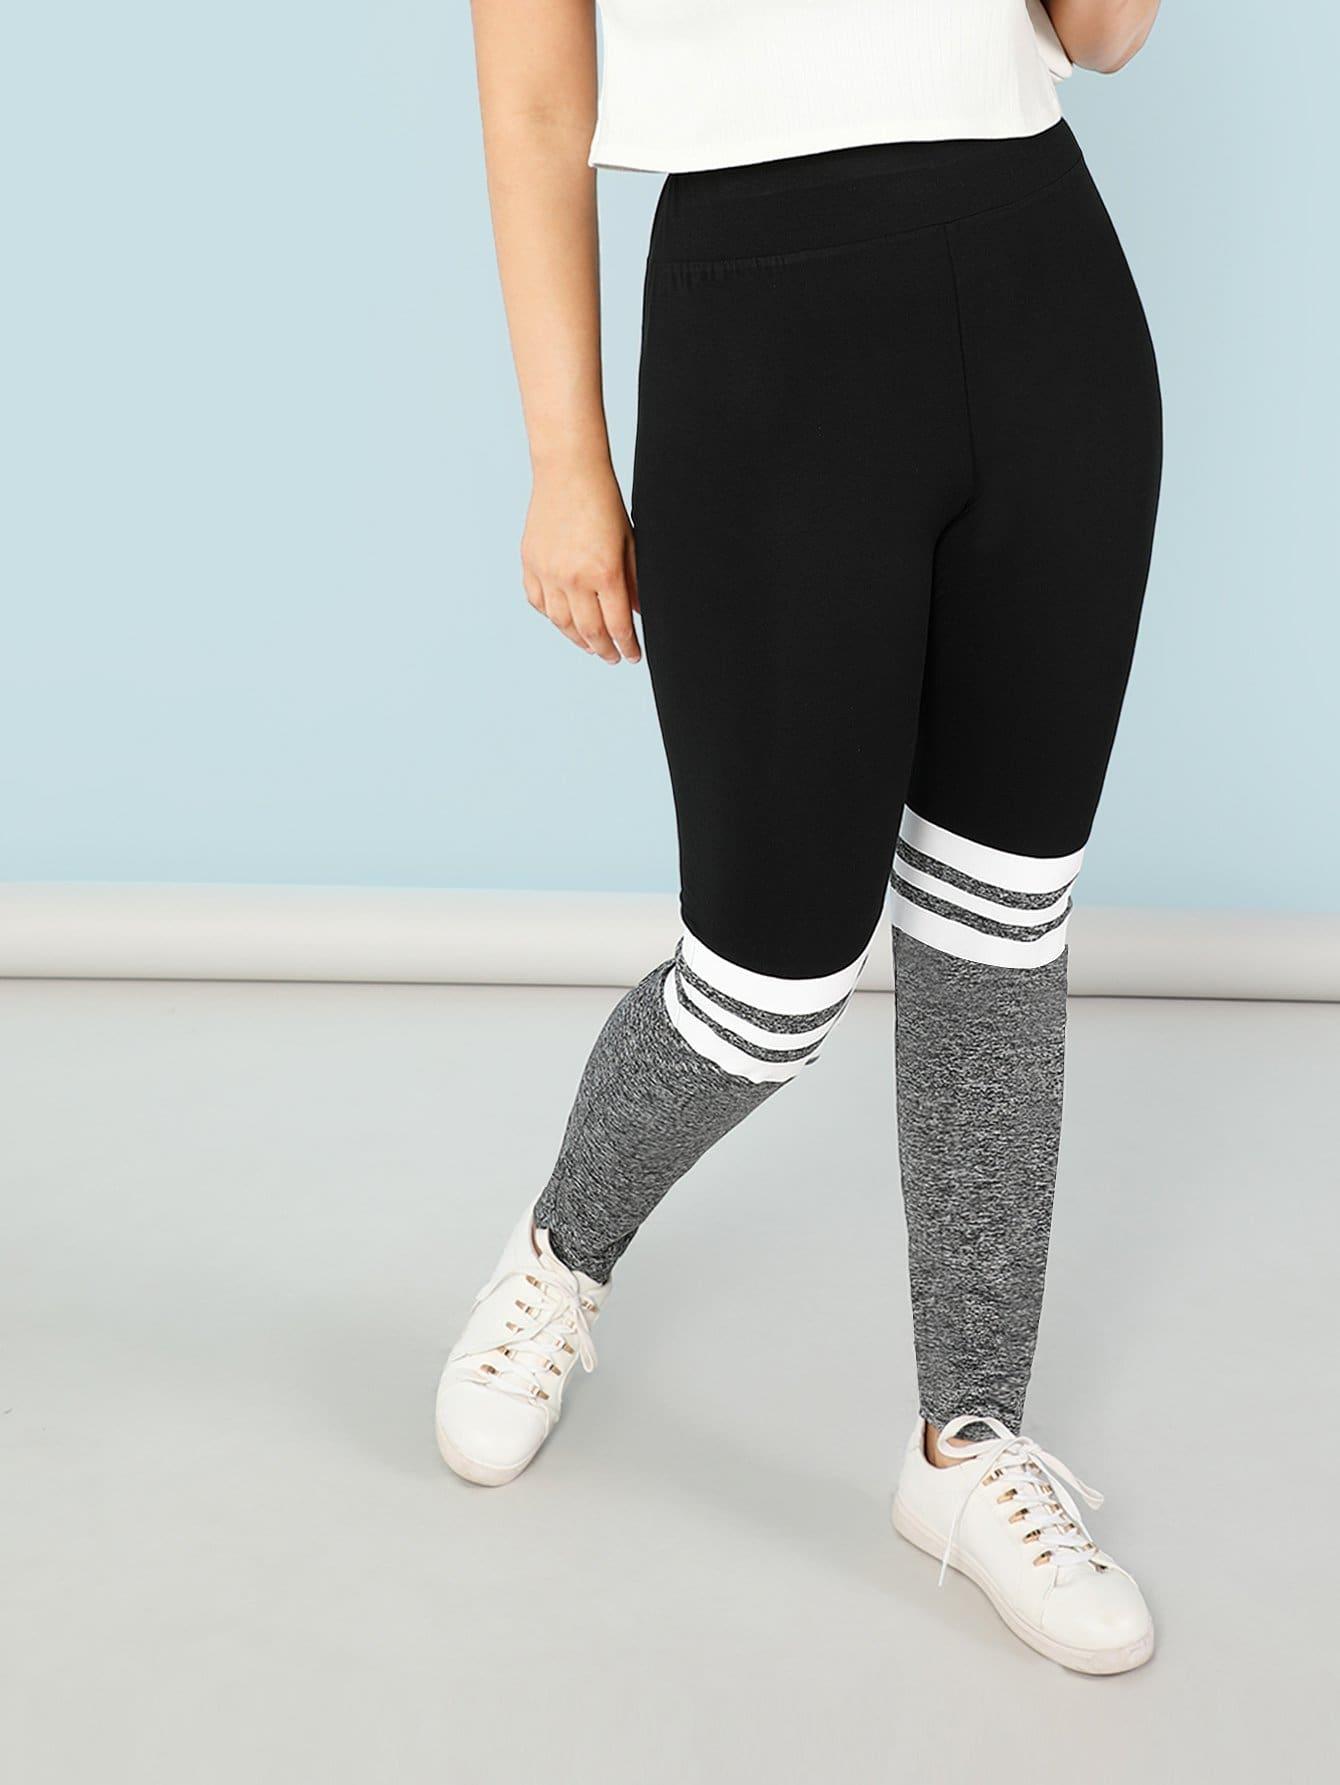 Plus Color Block Marled Stirrup Leggings marled knit topstitch stirrup leggings